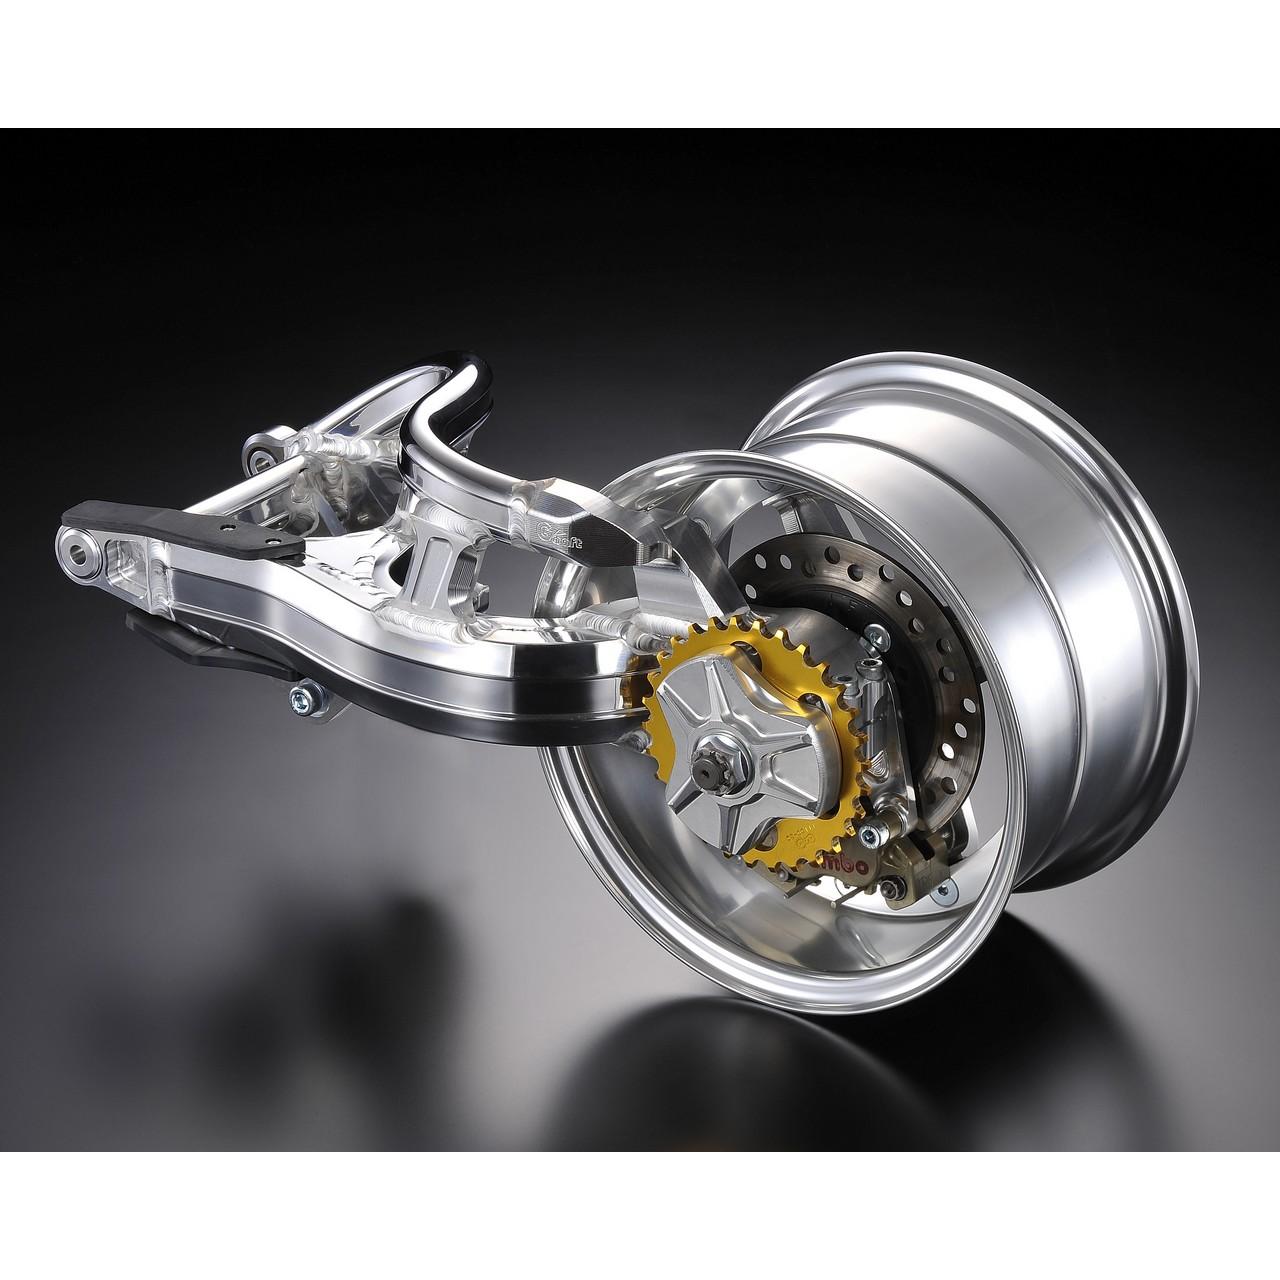 【G-Craft】單邊型後搖臂10英吋5.5J - 「Webike-摩托百貨」